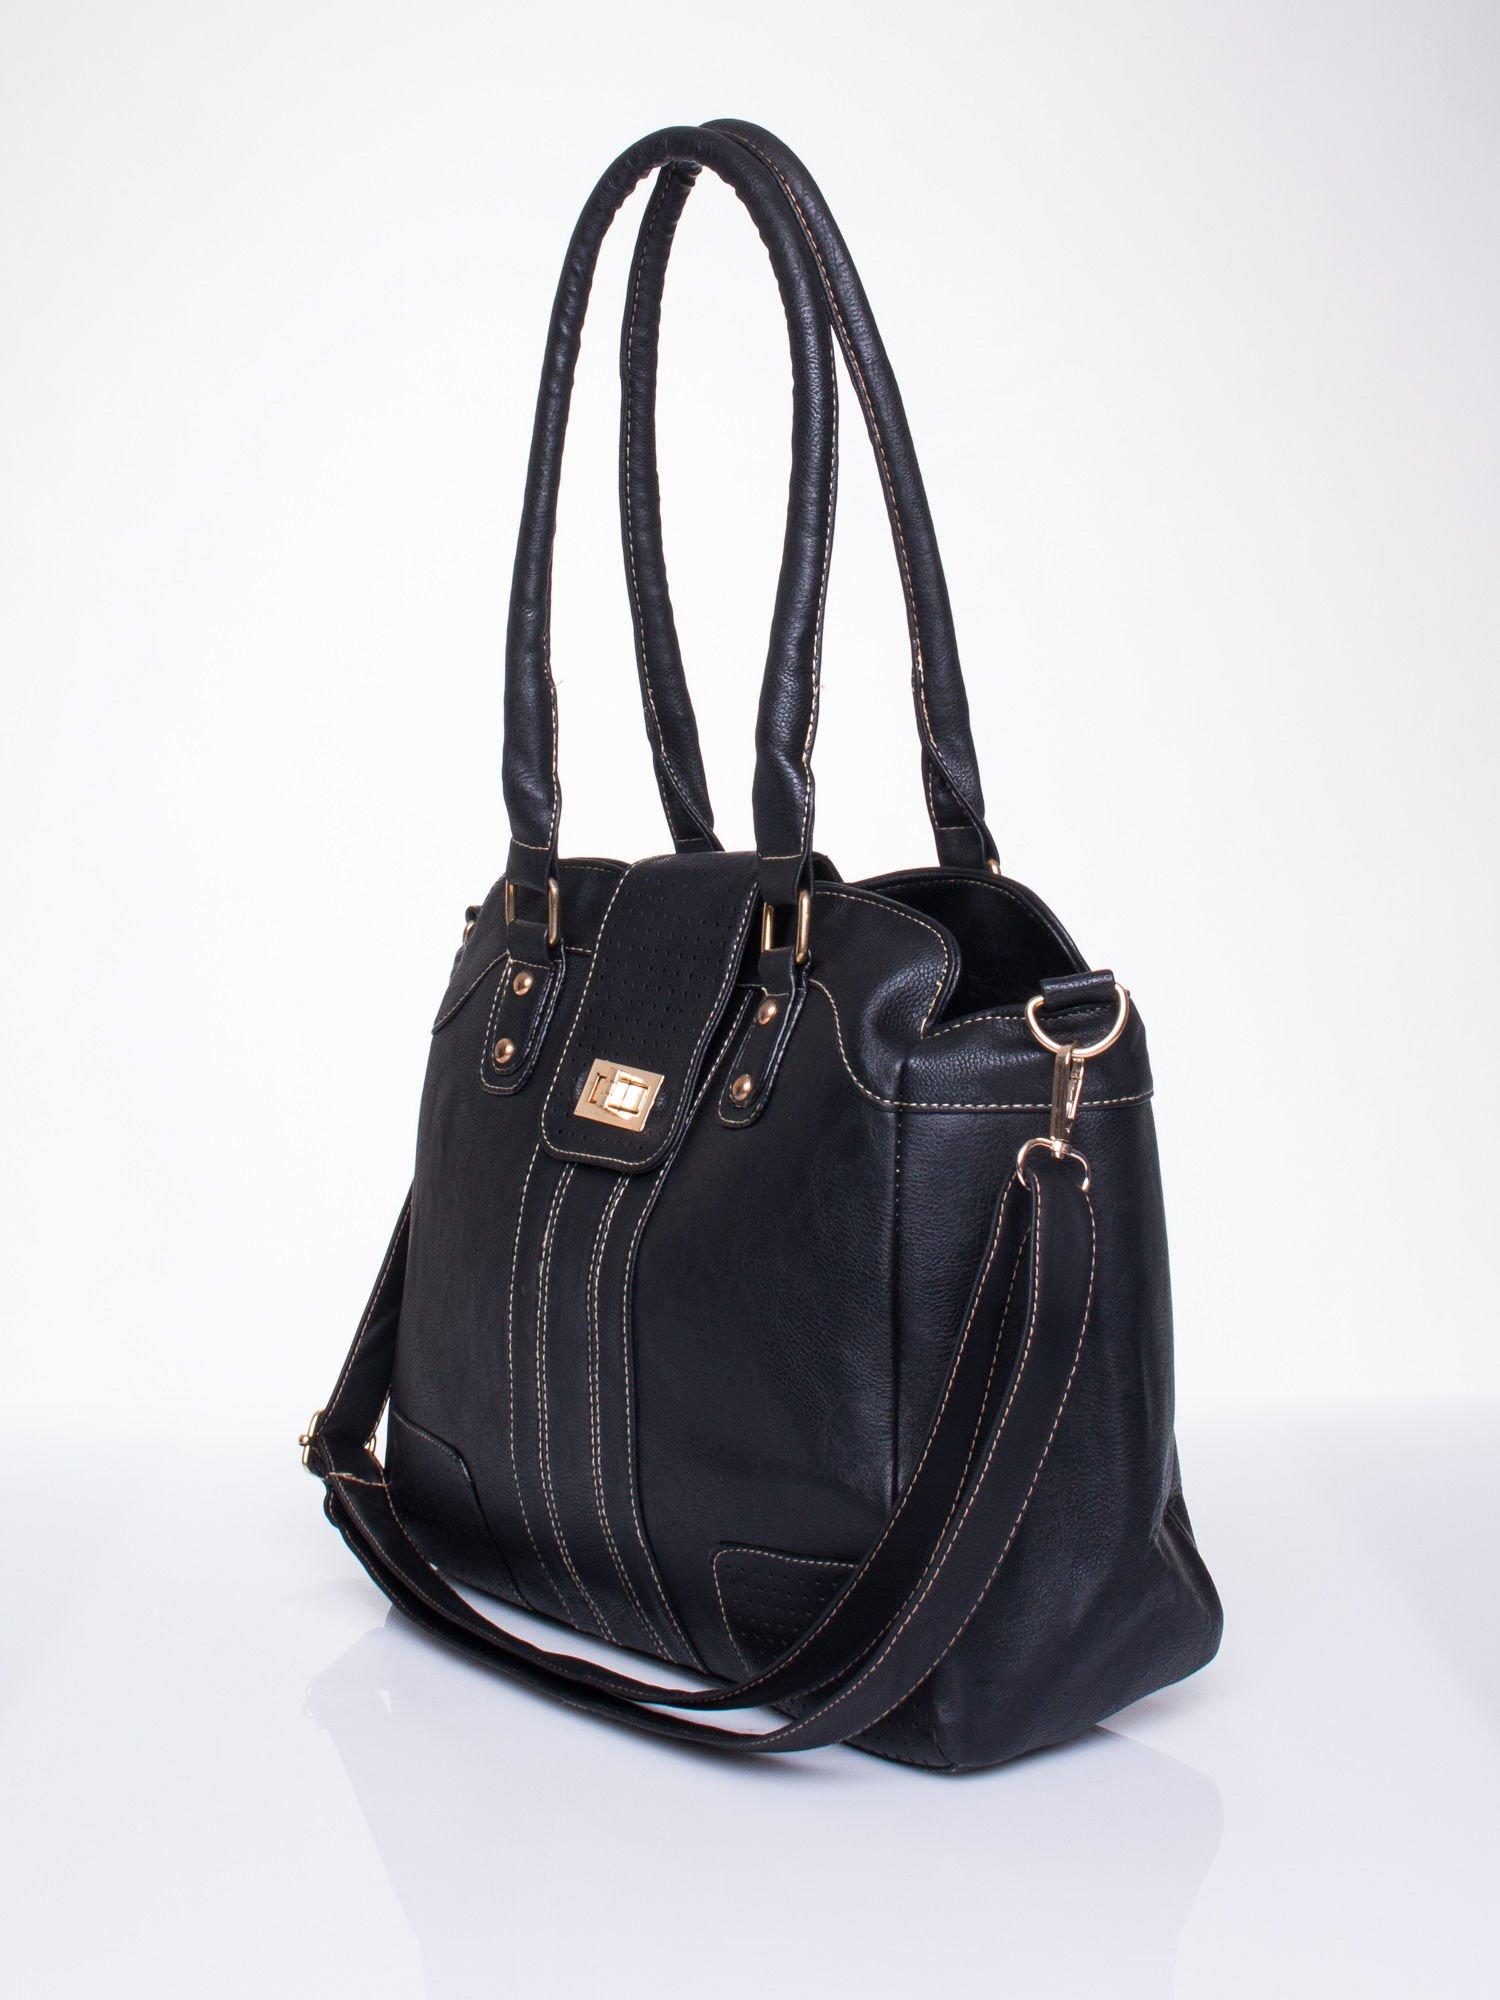 Czarna torba miejska z klapką                                  zdj.                                  3